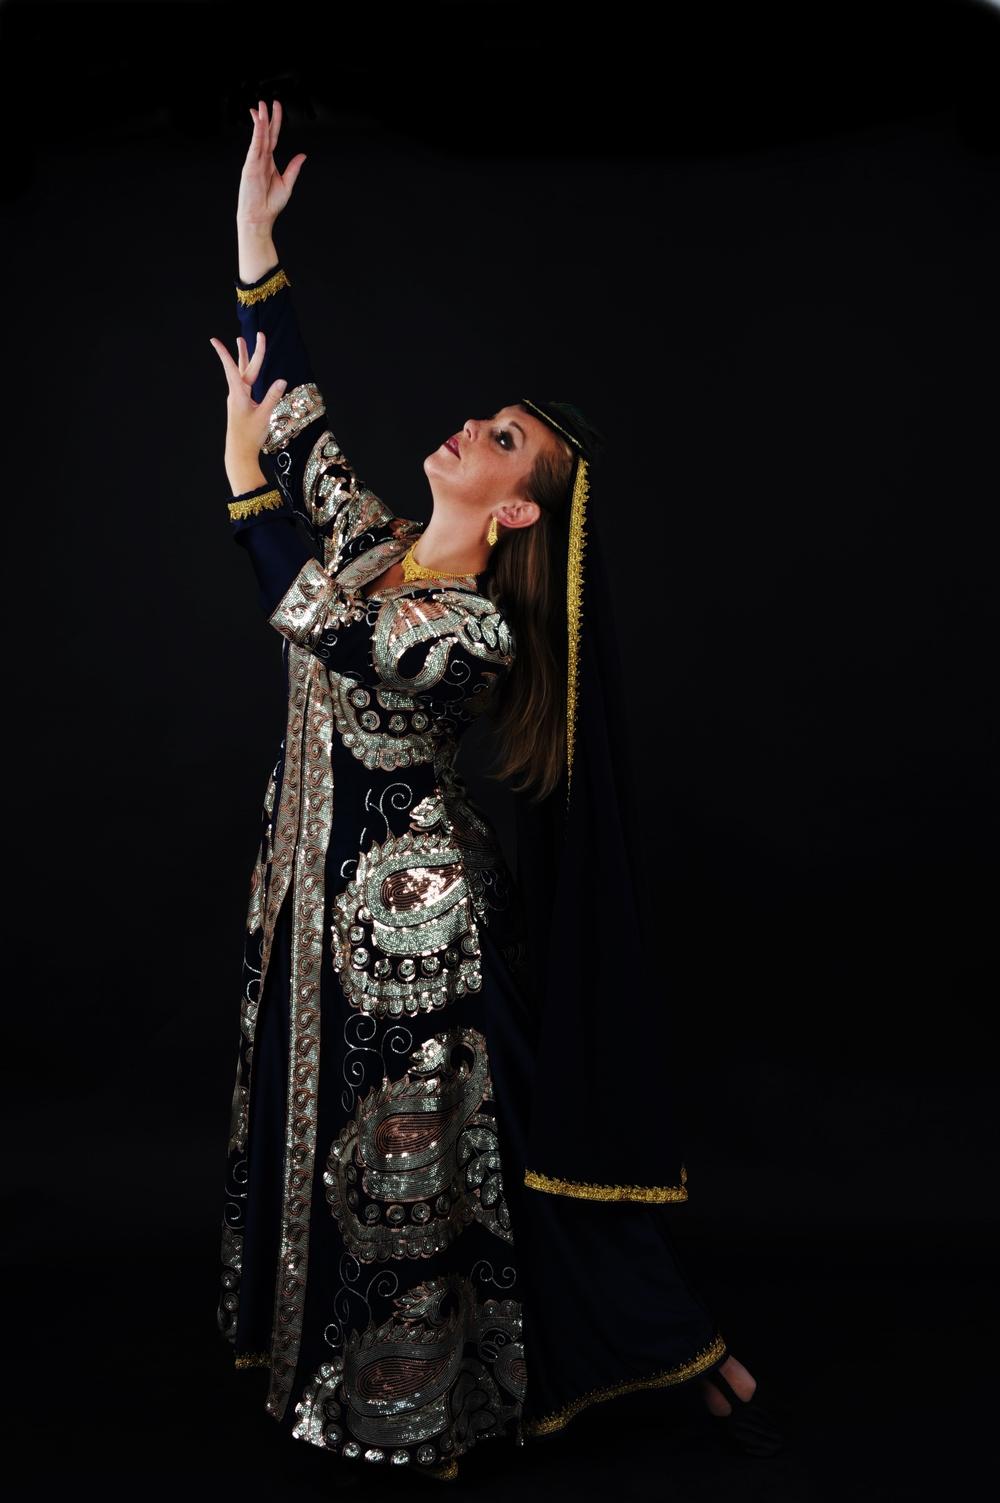 Maria Oriental - Persian Classical Dance. Photo: Lars Uddén, Swefoto AB